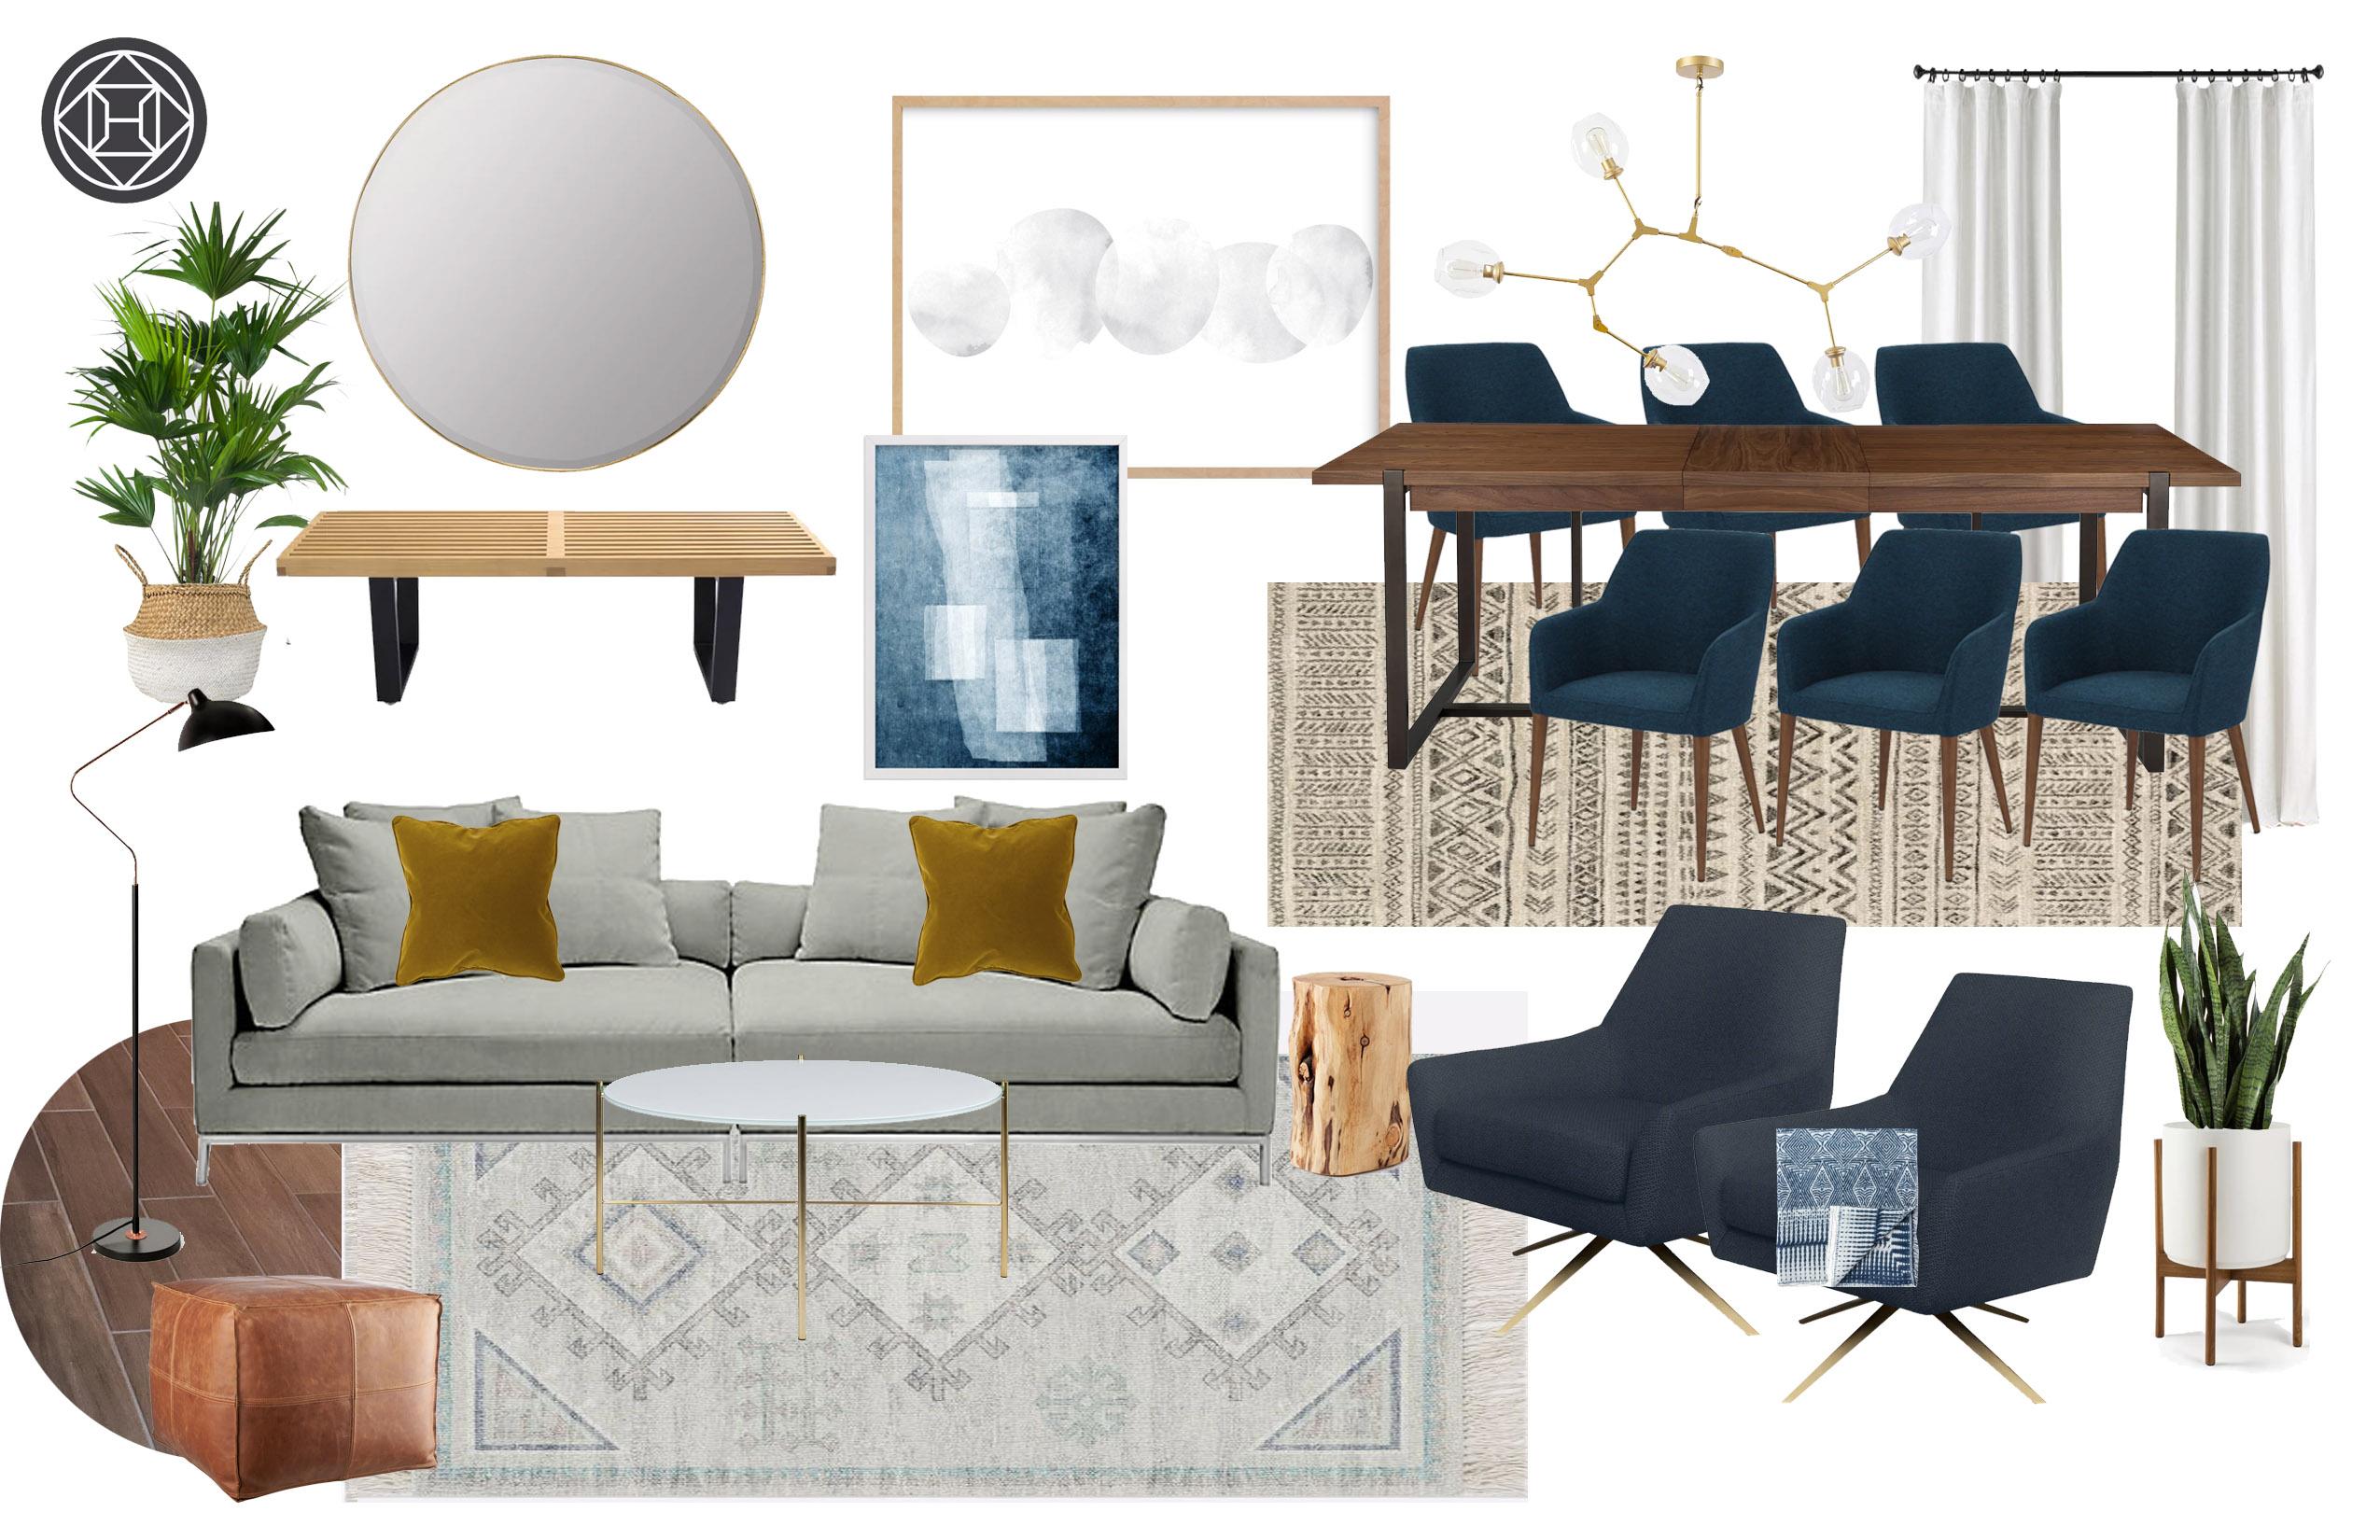 Contemporary Bohemian Living Room Design By Havenly Interior Designer Liliana